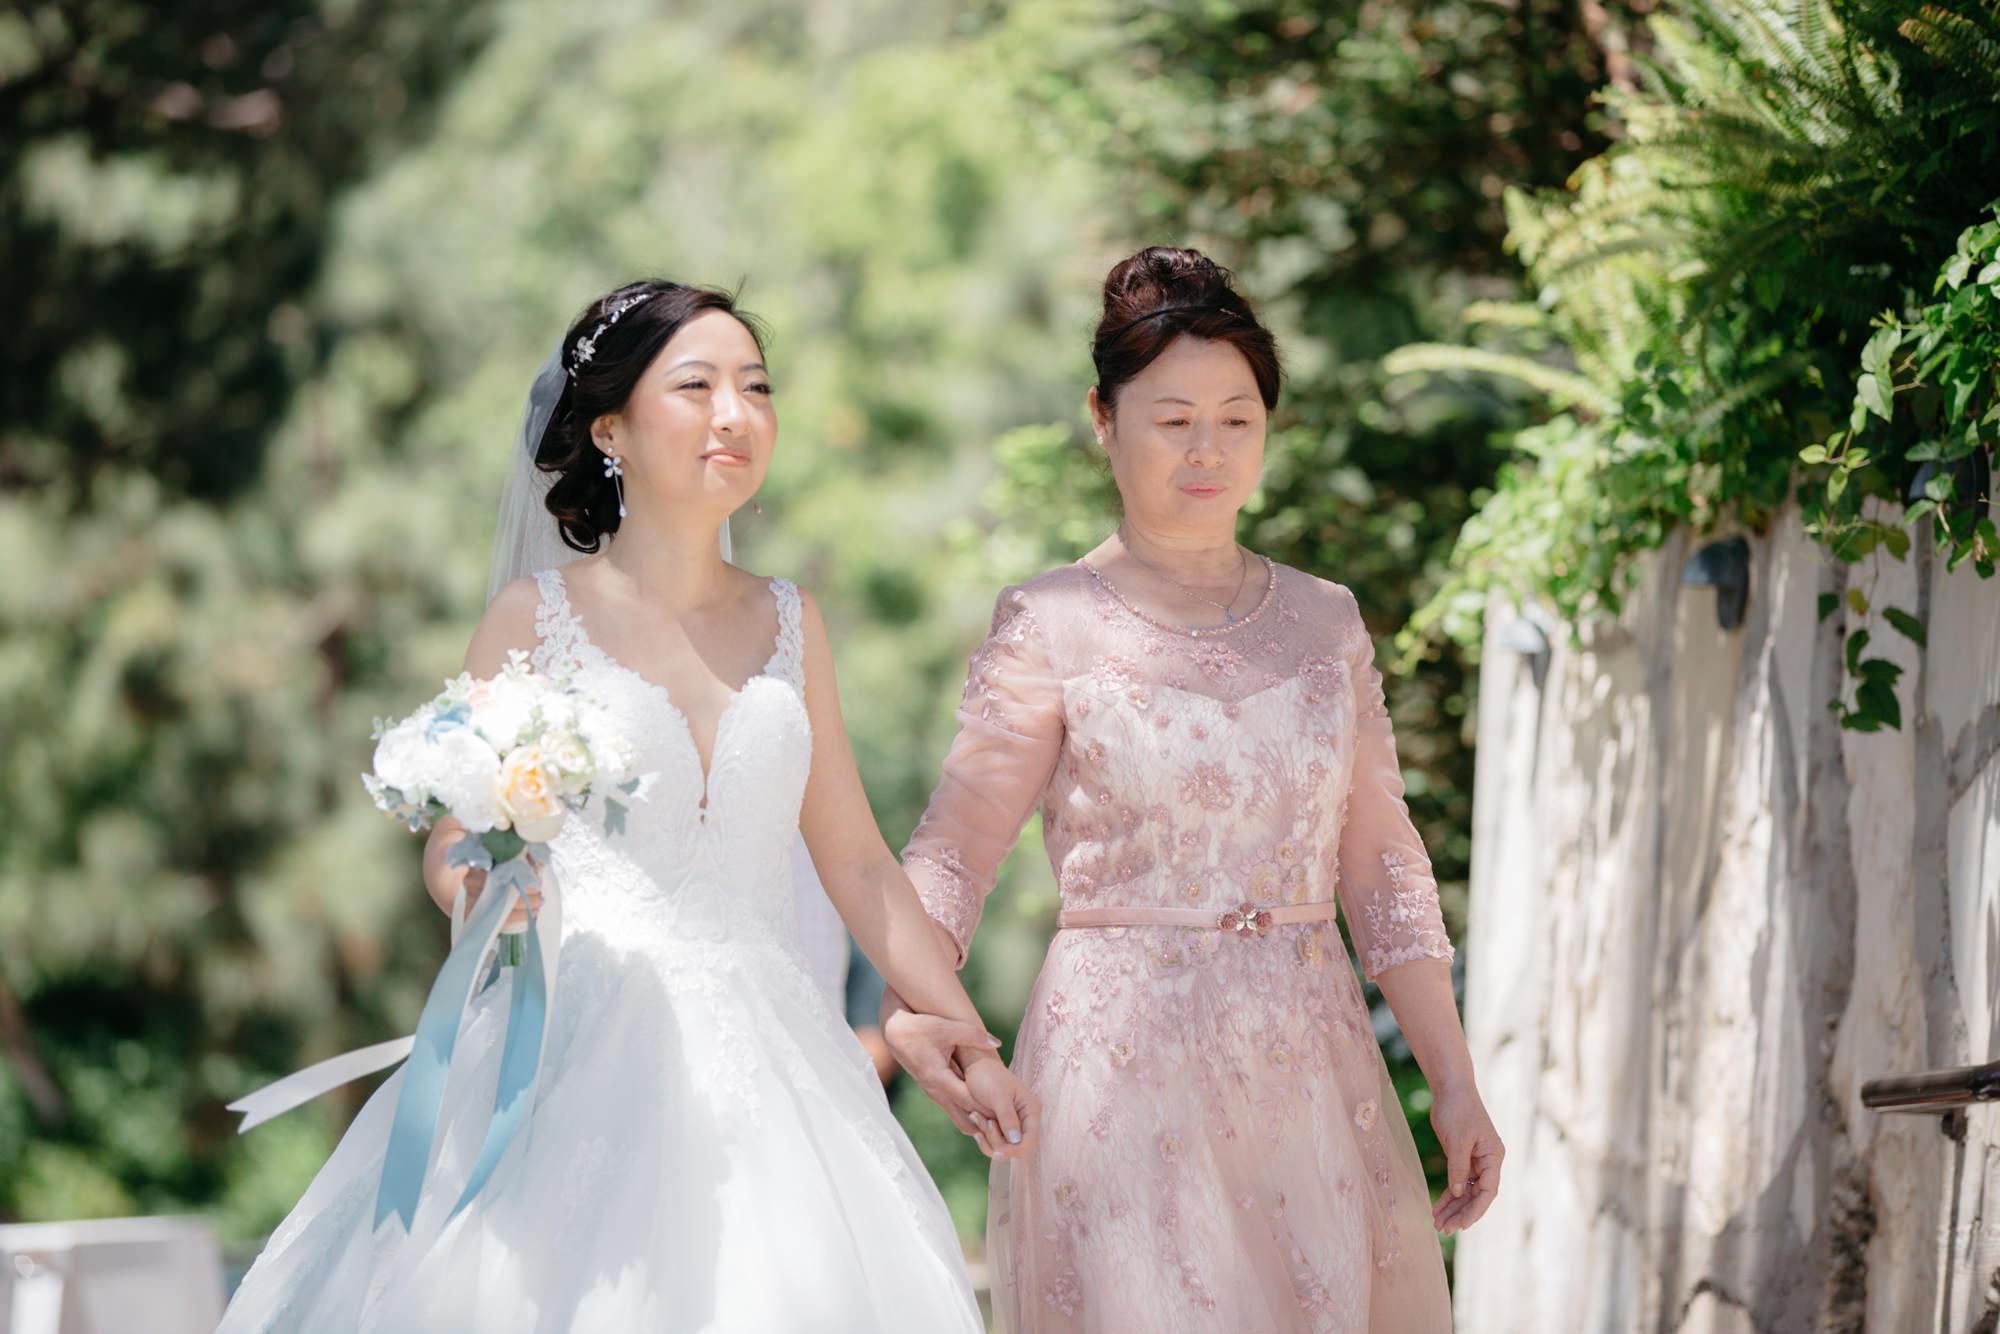 Tian and Cherry by Jenna Pangan-26.jpg